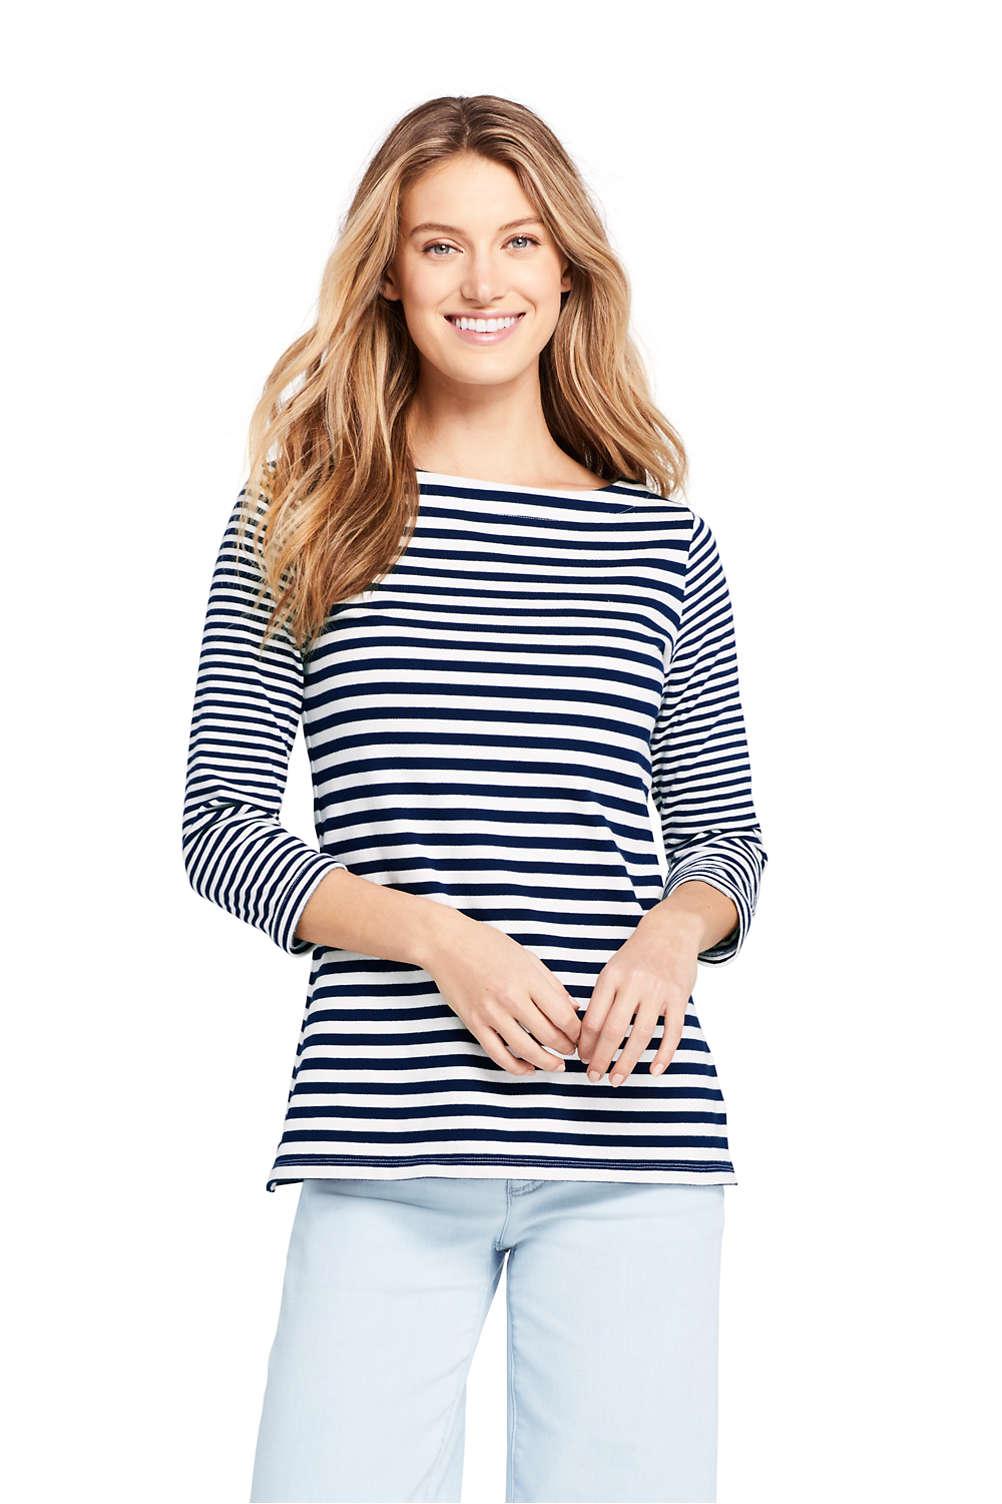 9184d14bd6 Women's 3/4 Sleeve Stripe Boatneck Top from Lands' End